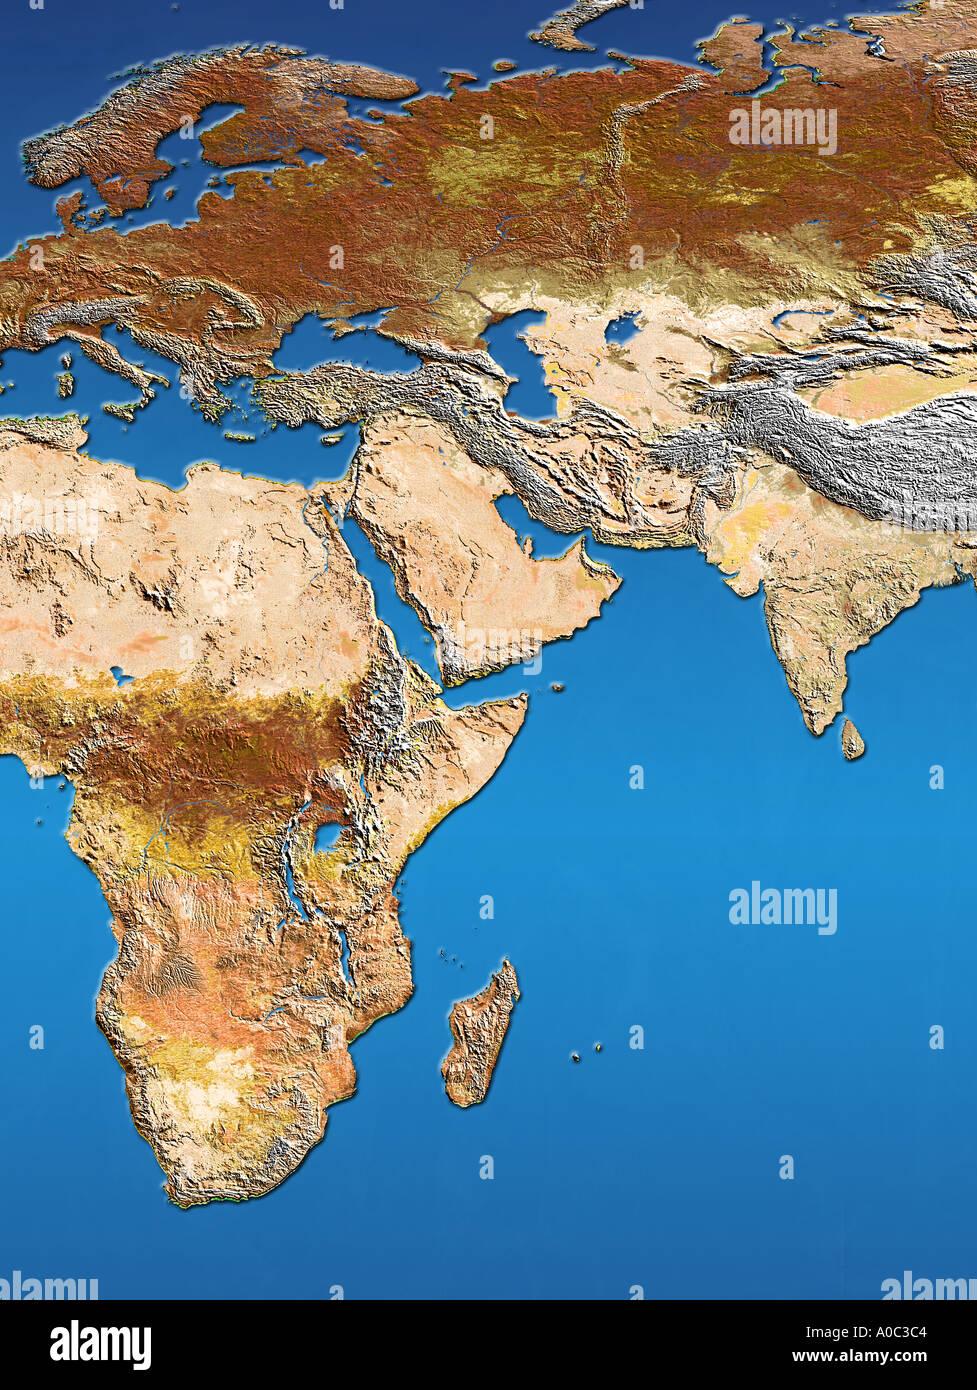 Satellite image map of Africa Arabia Europe Scandinavia India and ...